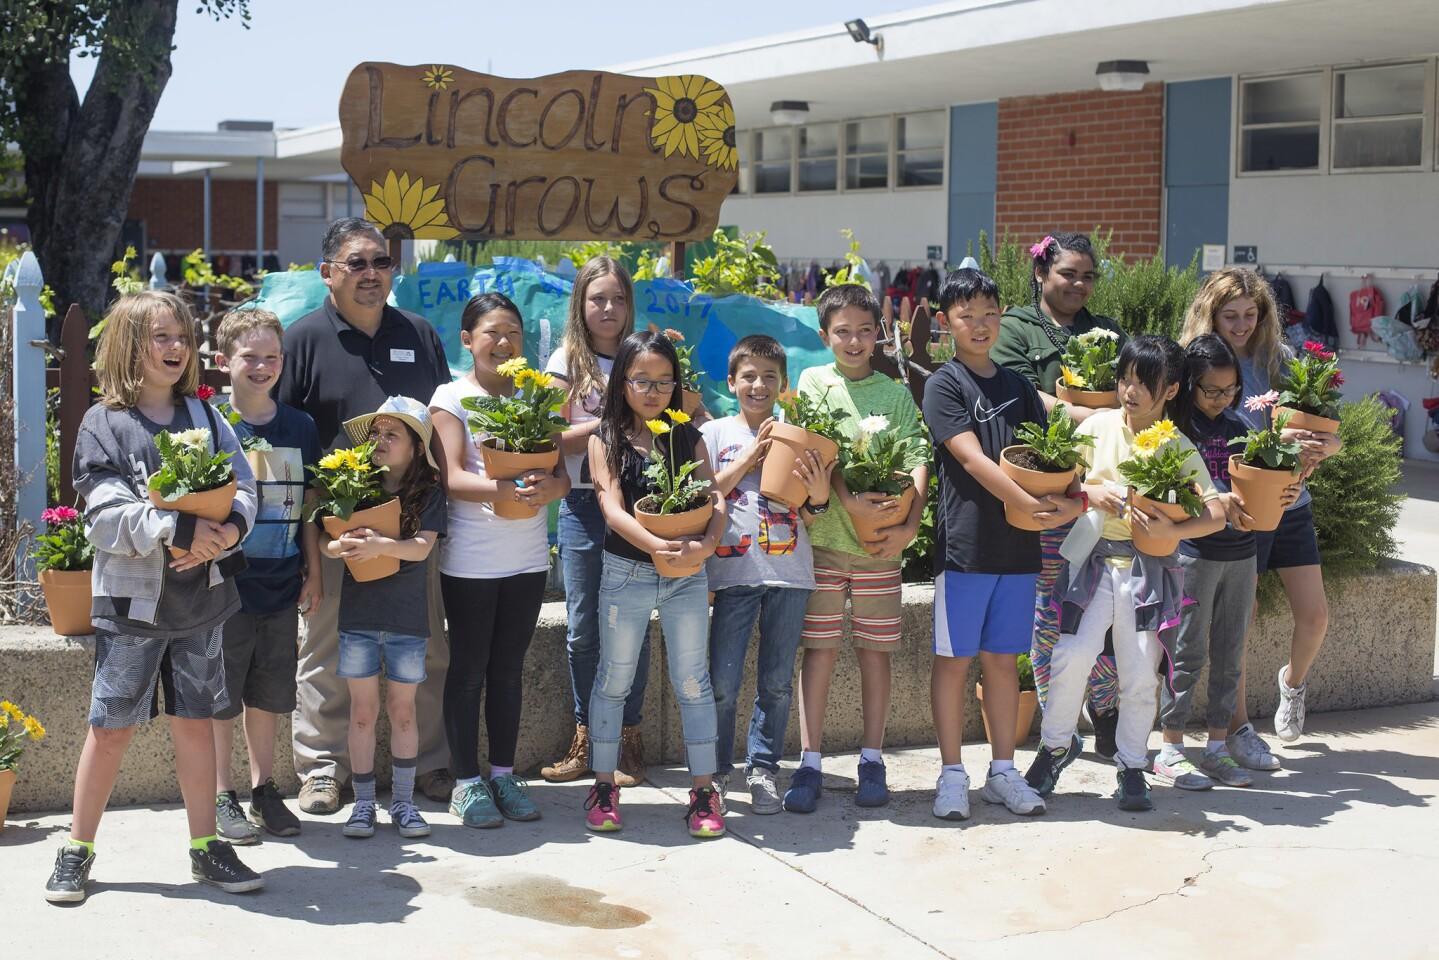 Lincoln Elementary School students celebrate Earth Week